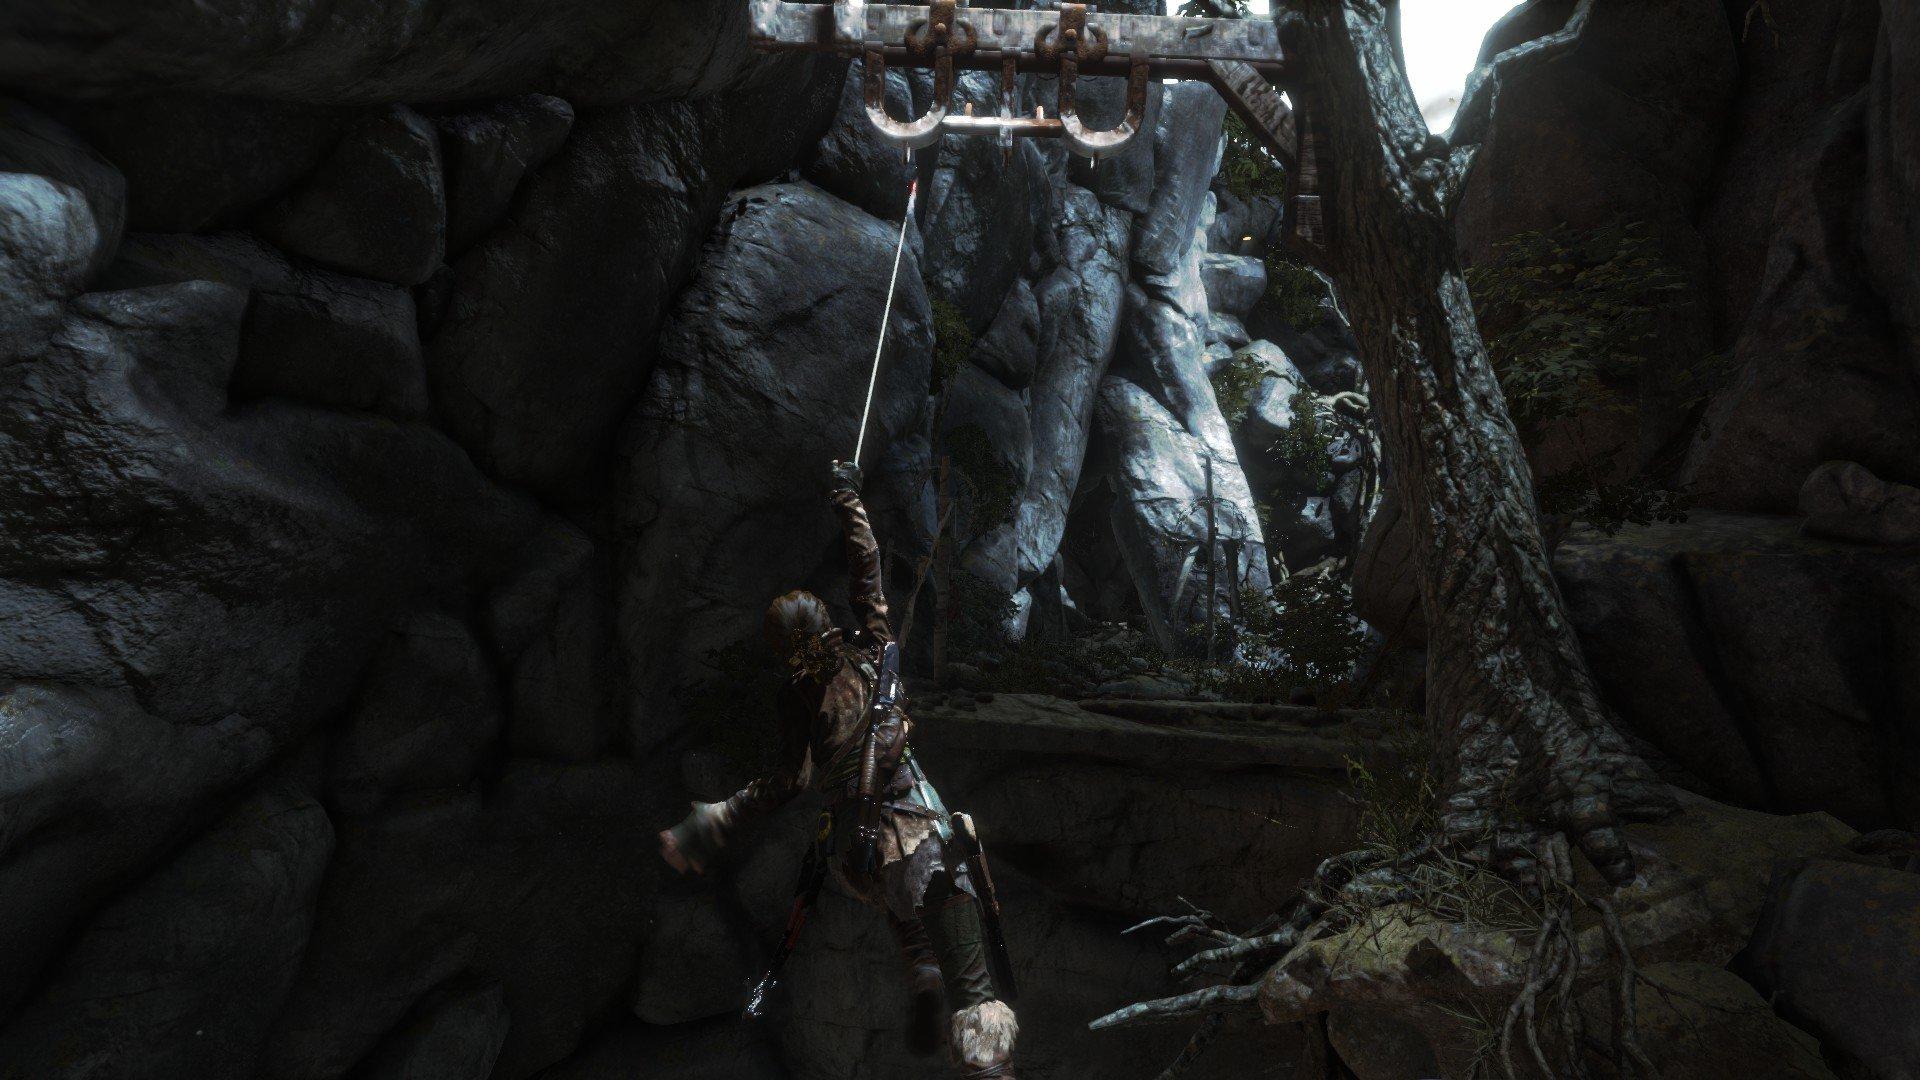 Rise of the Tomb Raider или да когда же этот медведь сдохнет?. - Изображение 25